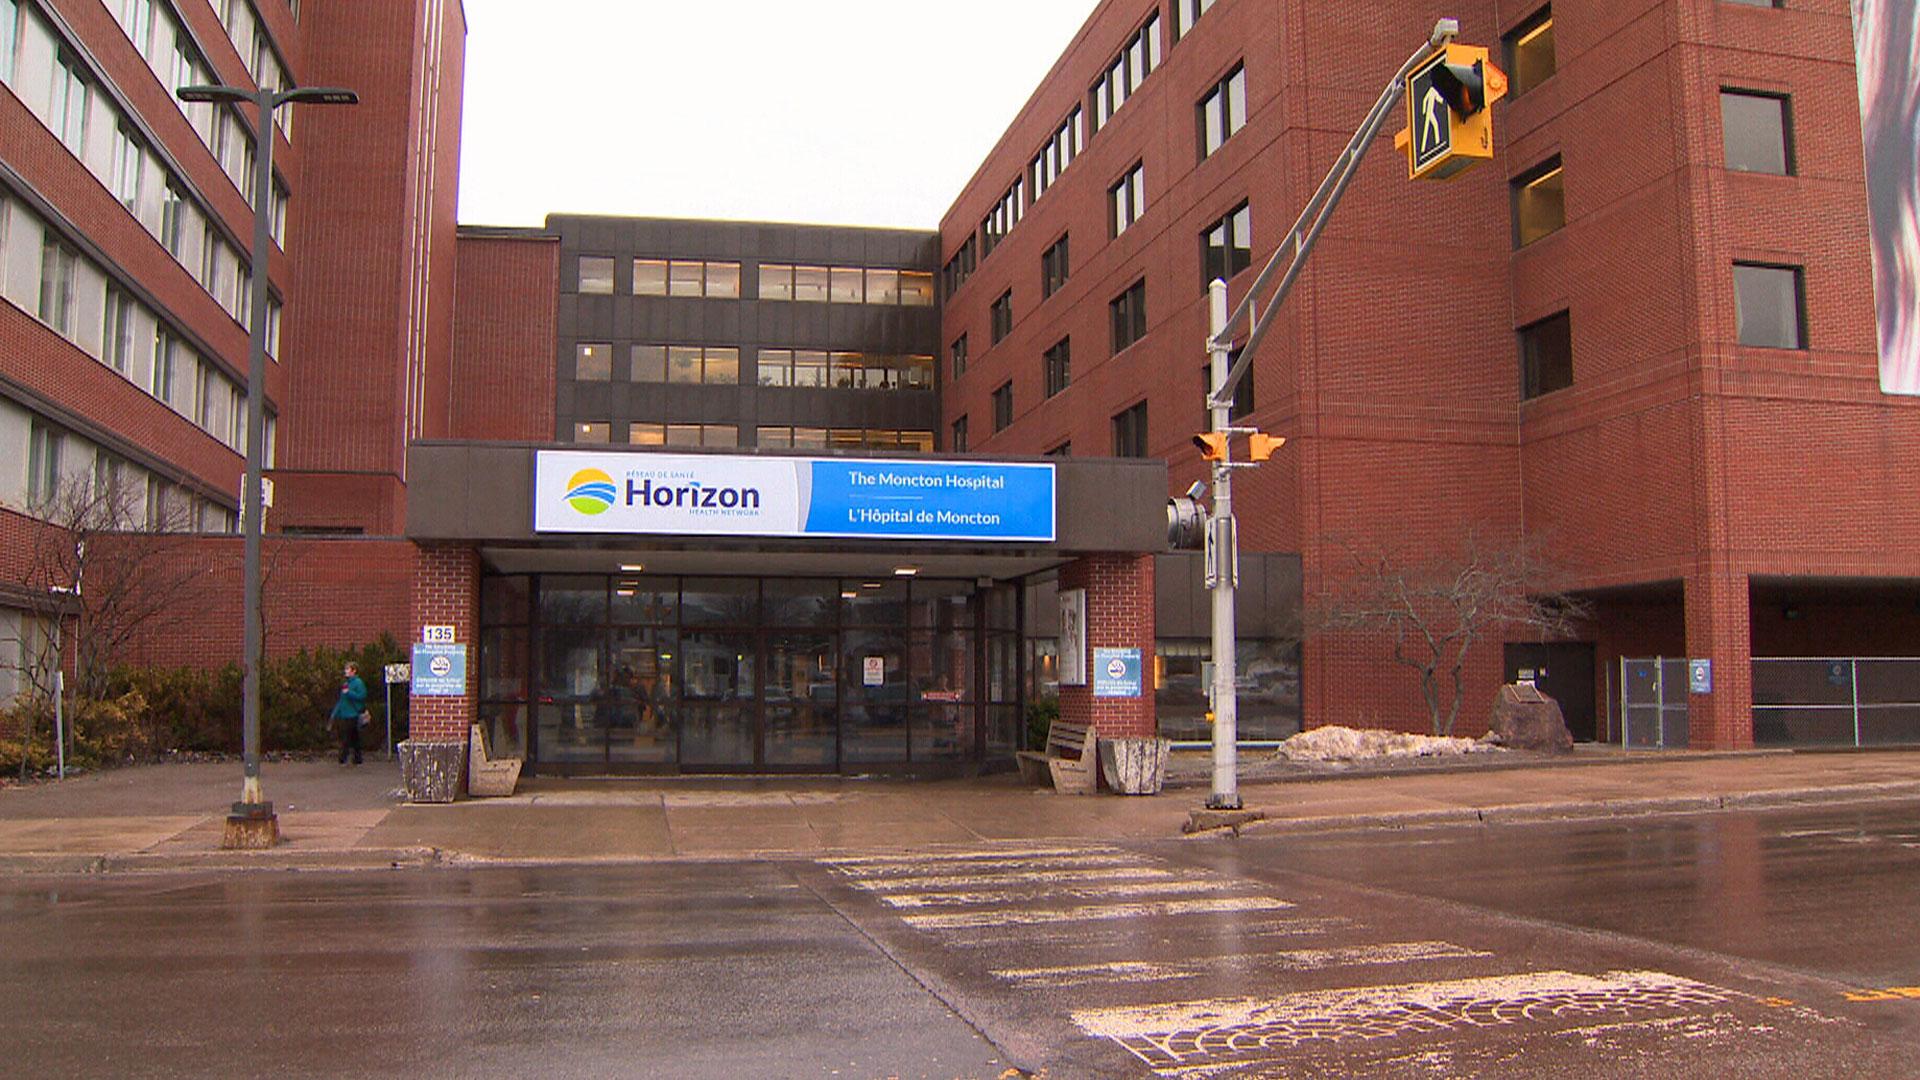 Firing of N B  nurse over suspected oxytocin misuse raises